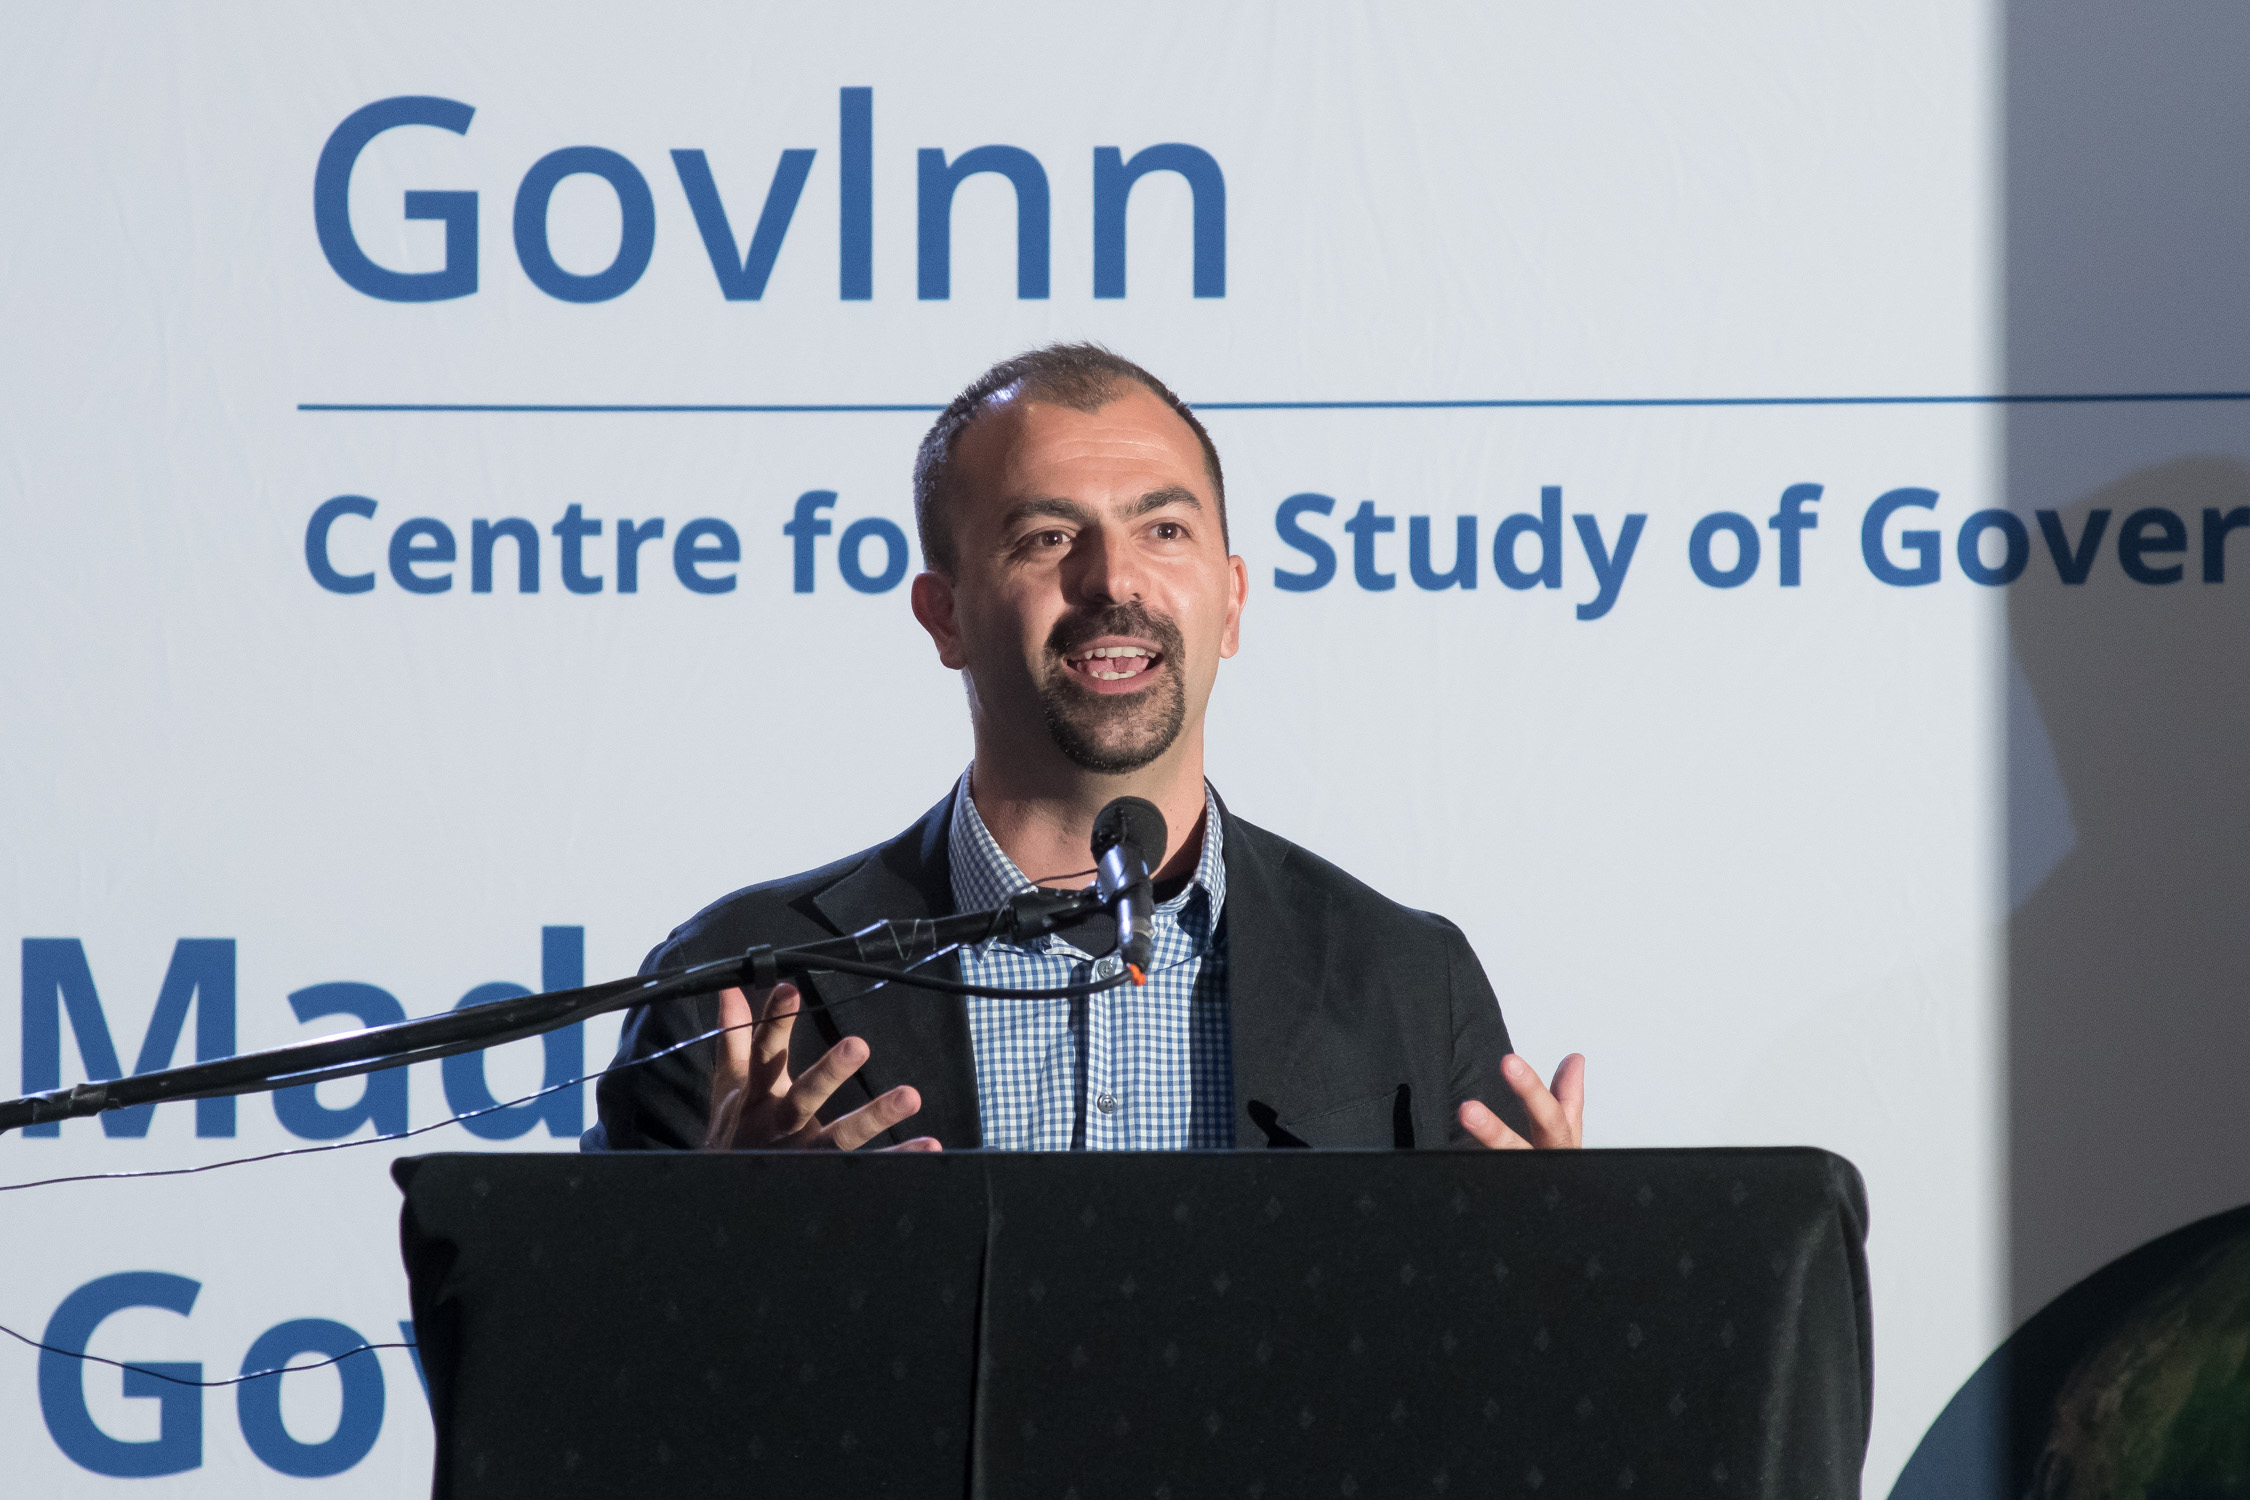 GovInn Director Prof. Lorenzo Fioramonti